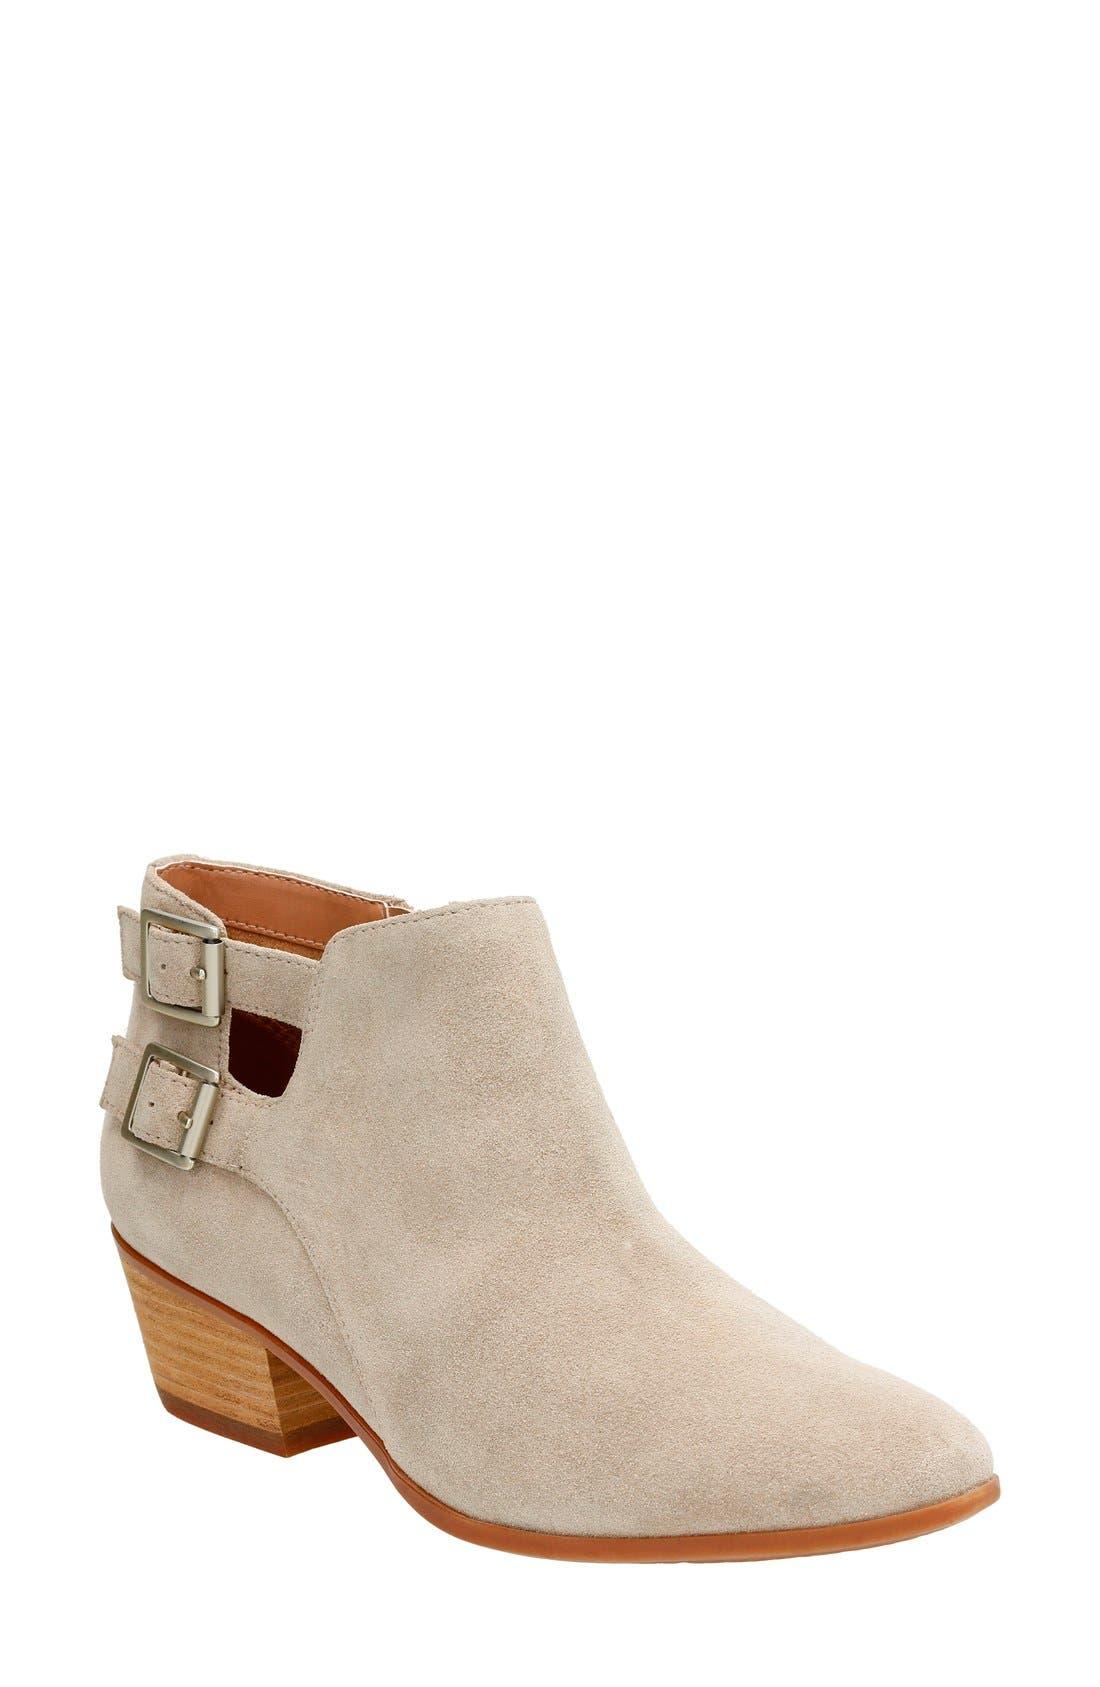 Alternate Image 1 Selected - Clarks® 'Spye Astro' Boot (Women)